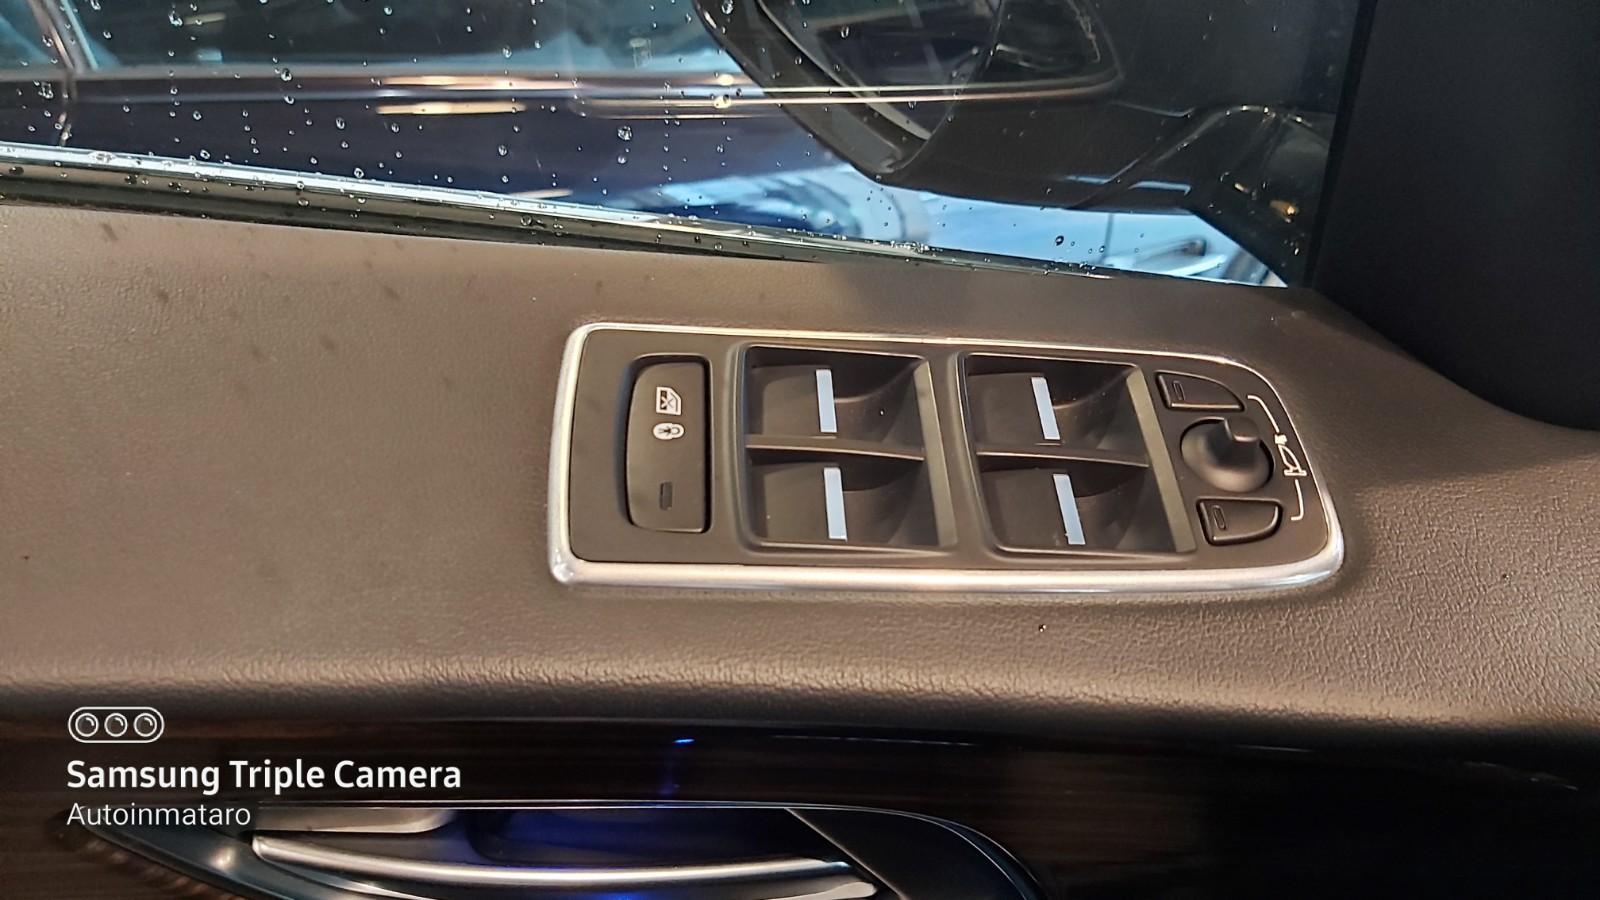 JAGUAR Fpace 3.0L TDV6 AWD Automatico Portfolio